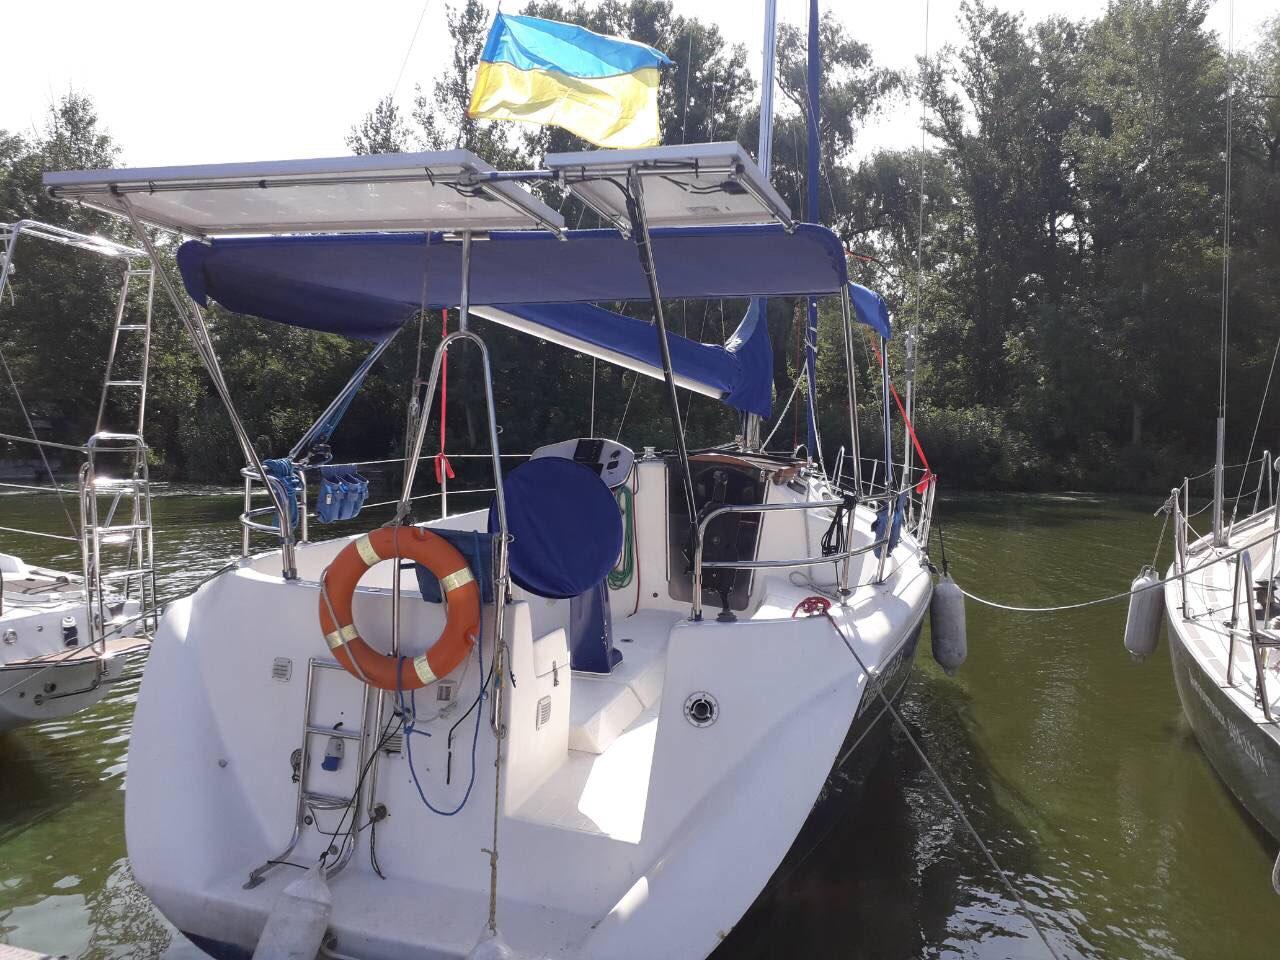 Twister 33 Аренда яхты в Днепропетровске  3